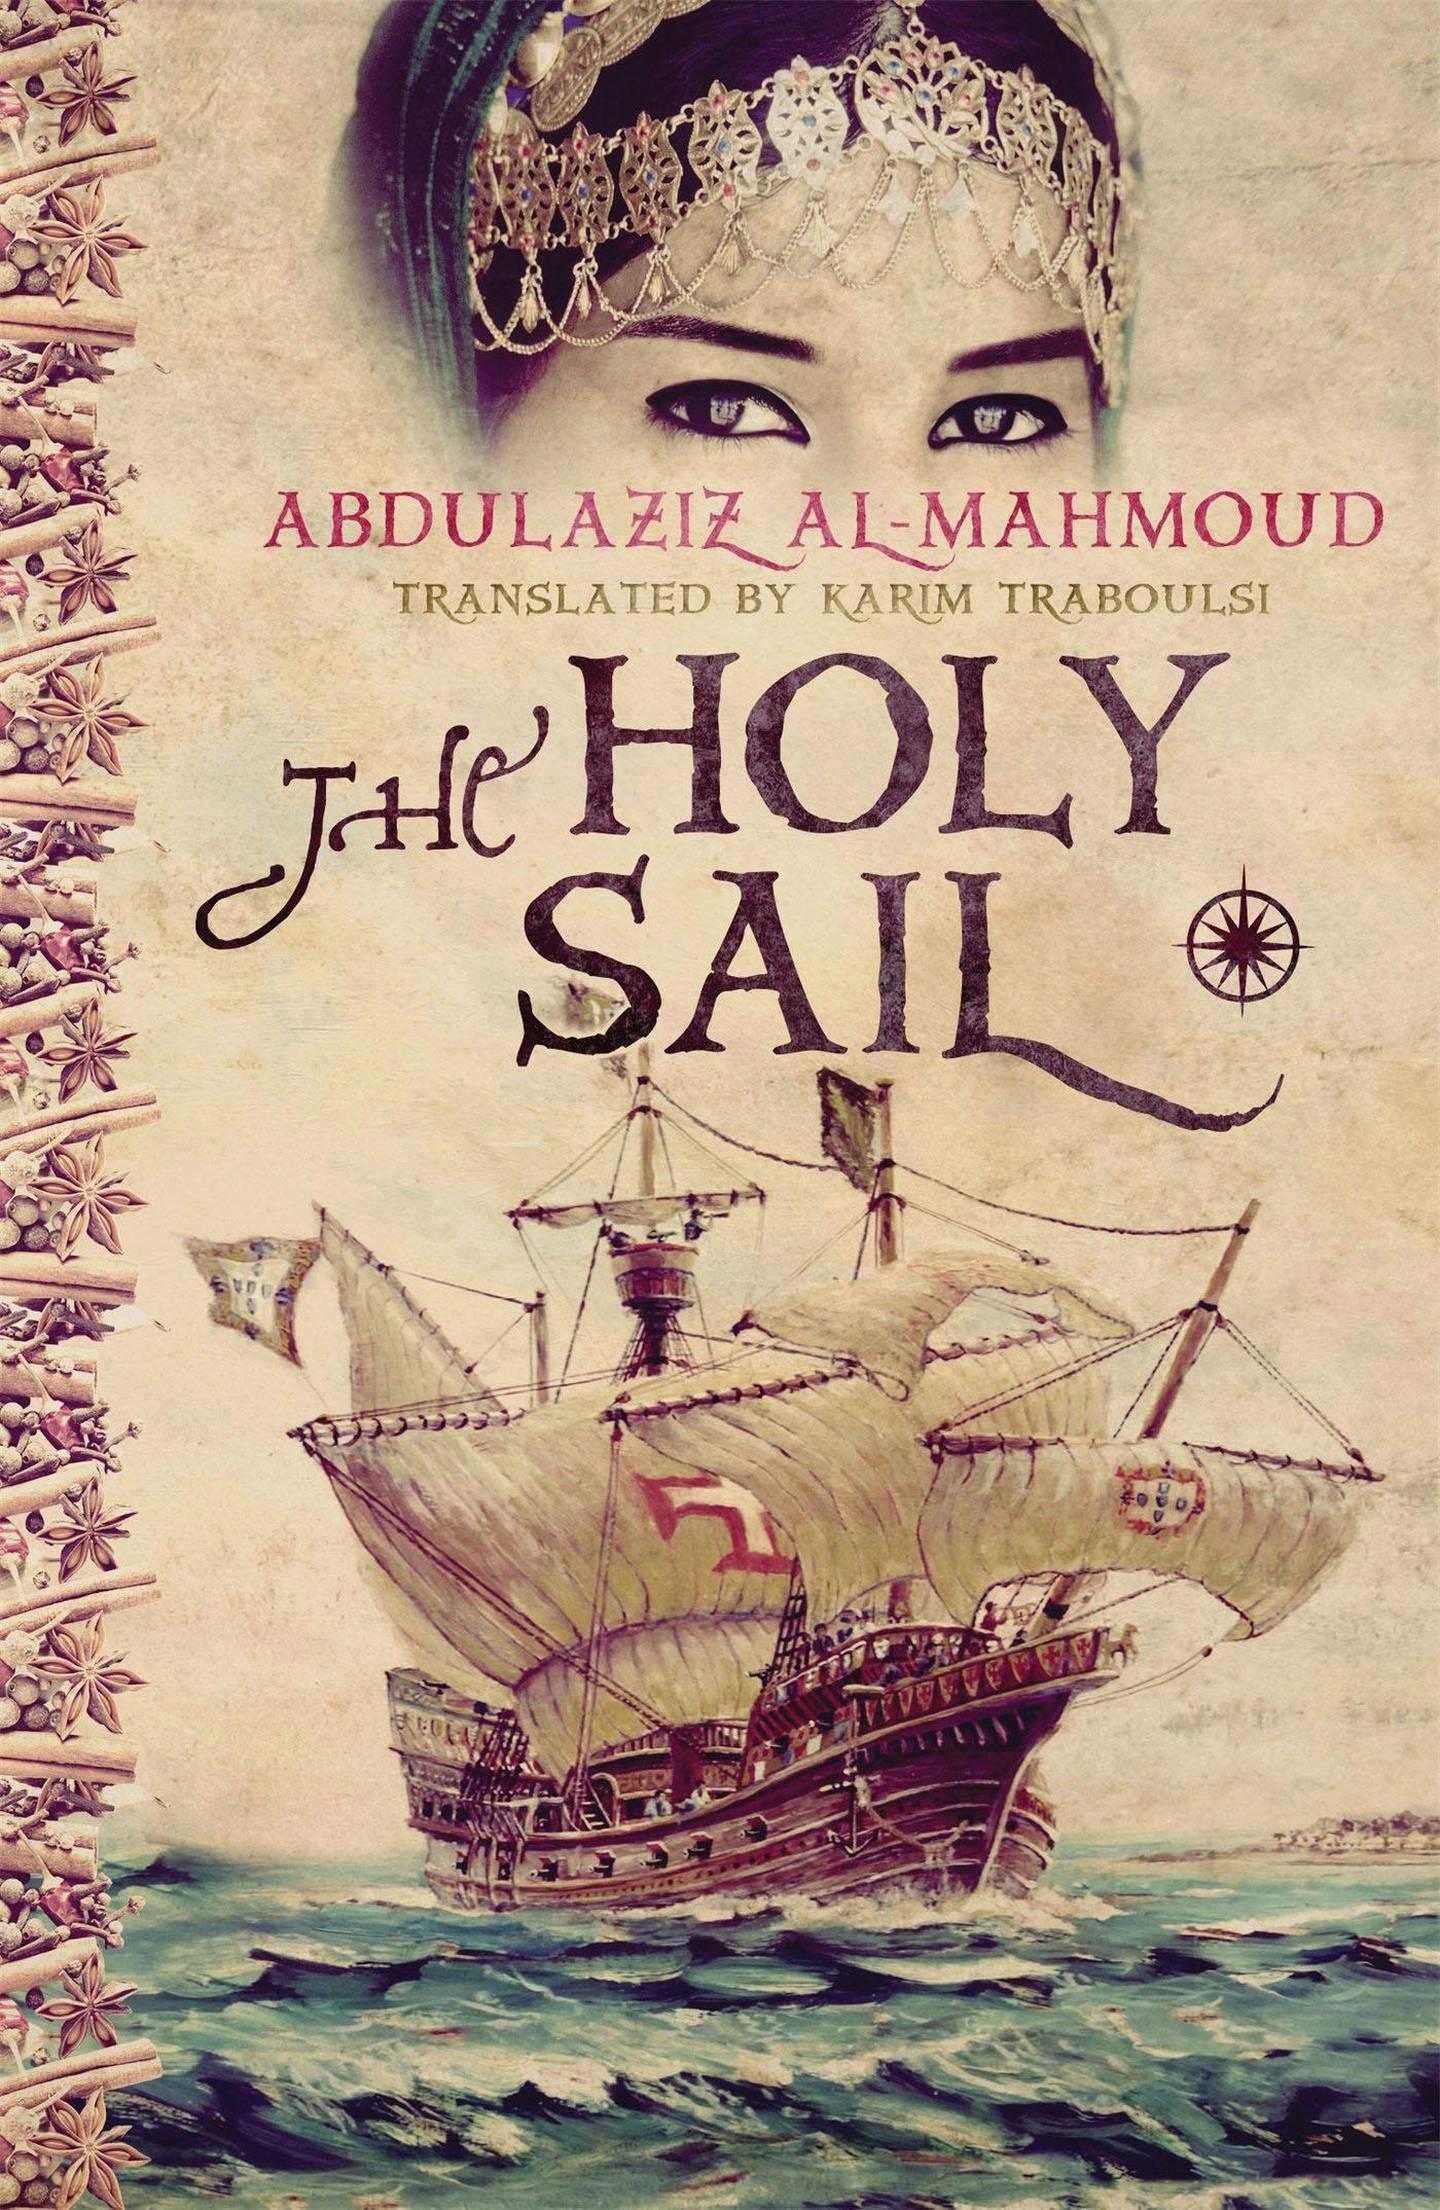 The Holy Sail by Abdulaziz Al Mahmoud (2015)